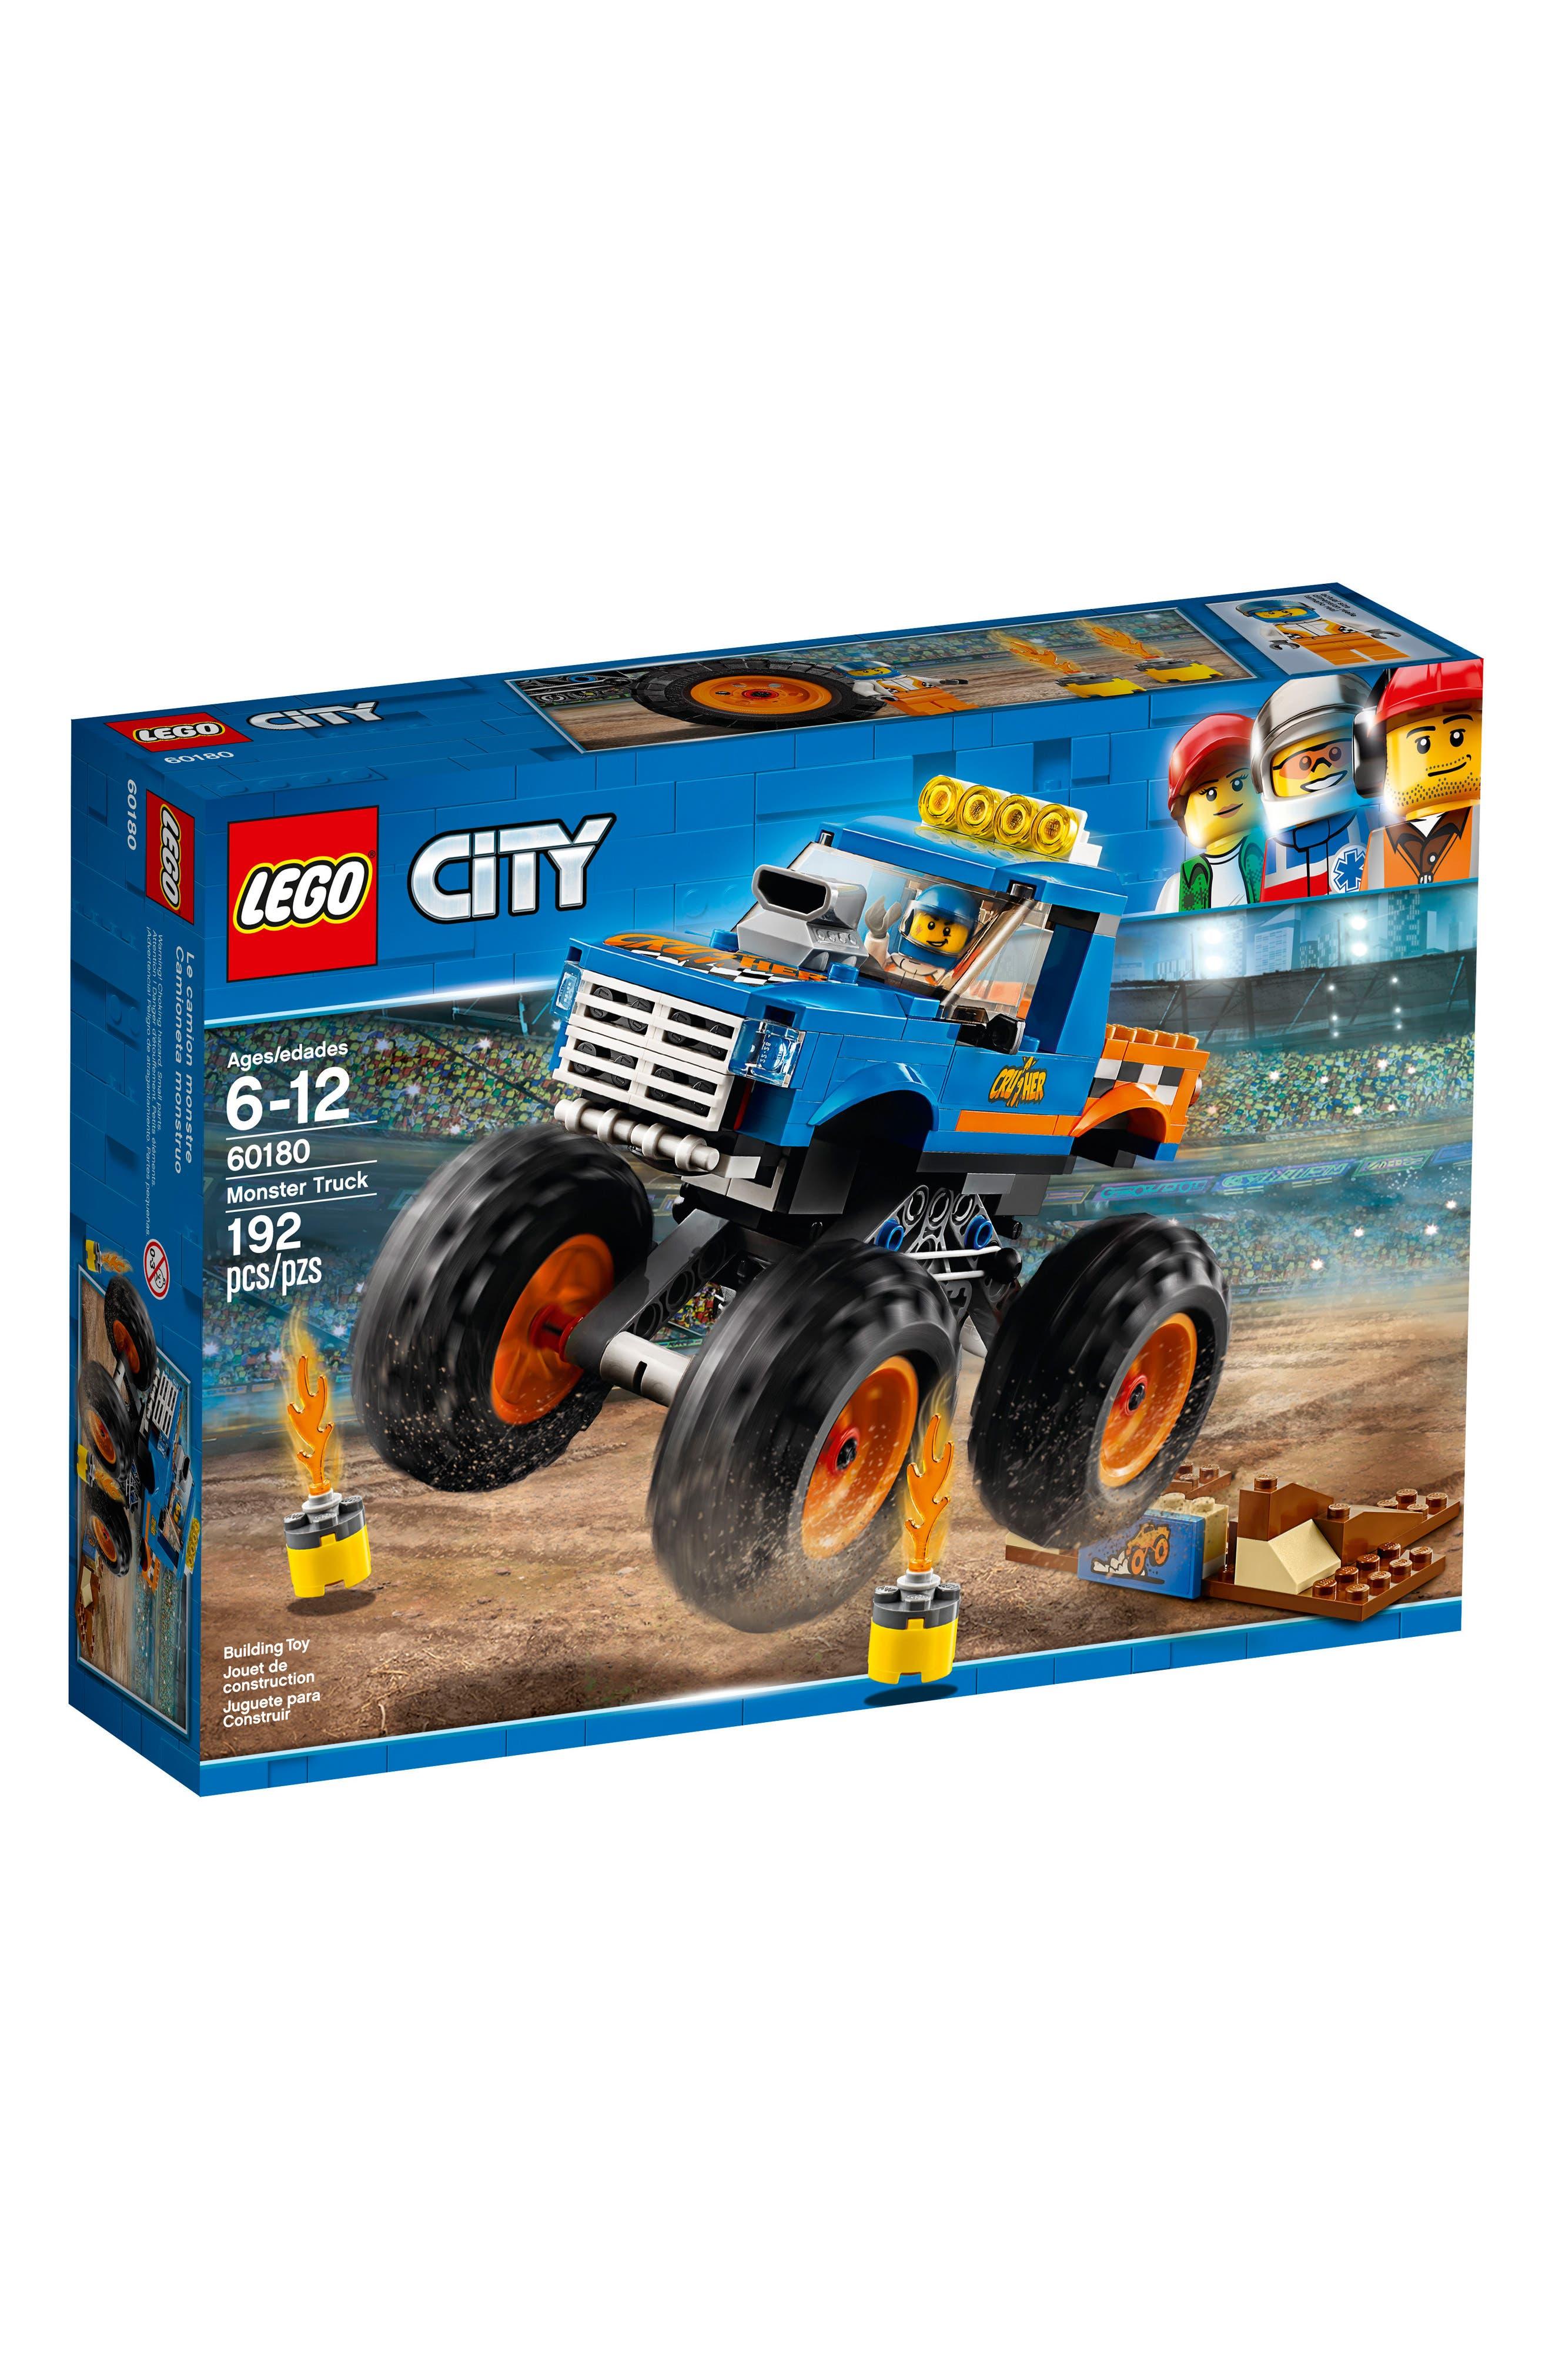 City Monster Truck - 60180,                         Main,                         color, Multi